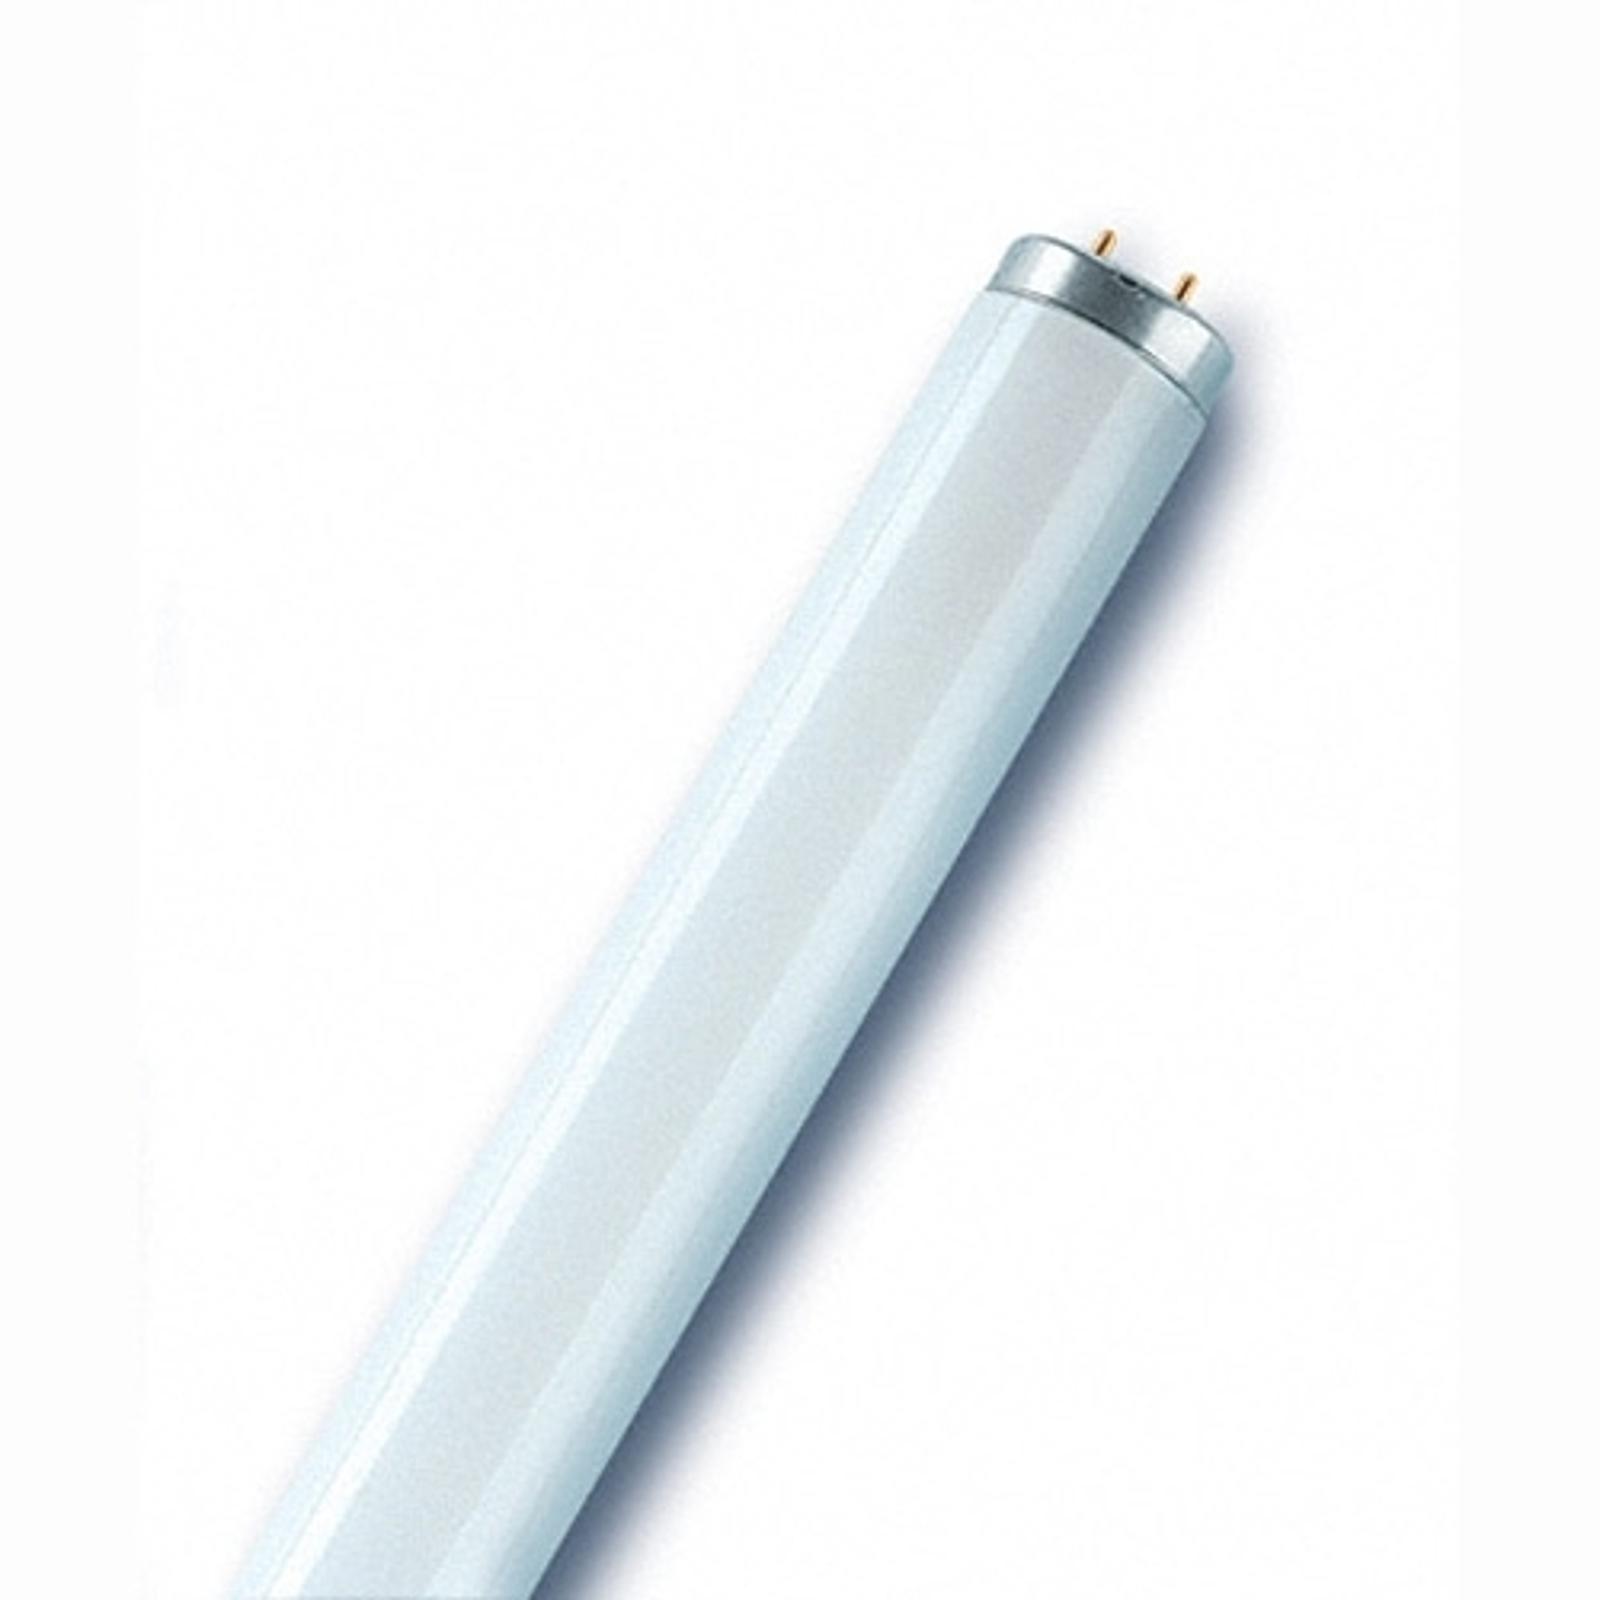 Leuchtstoffröhre G13 T12 20W SA-Ausführung